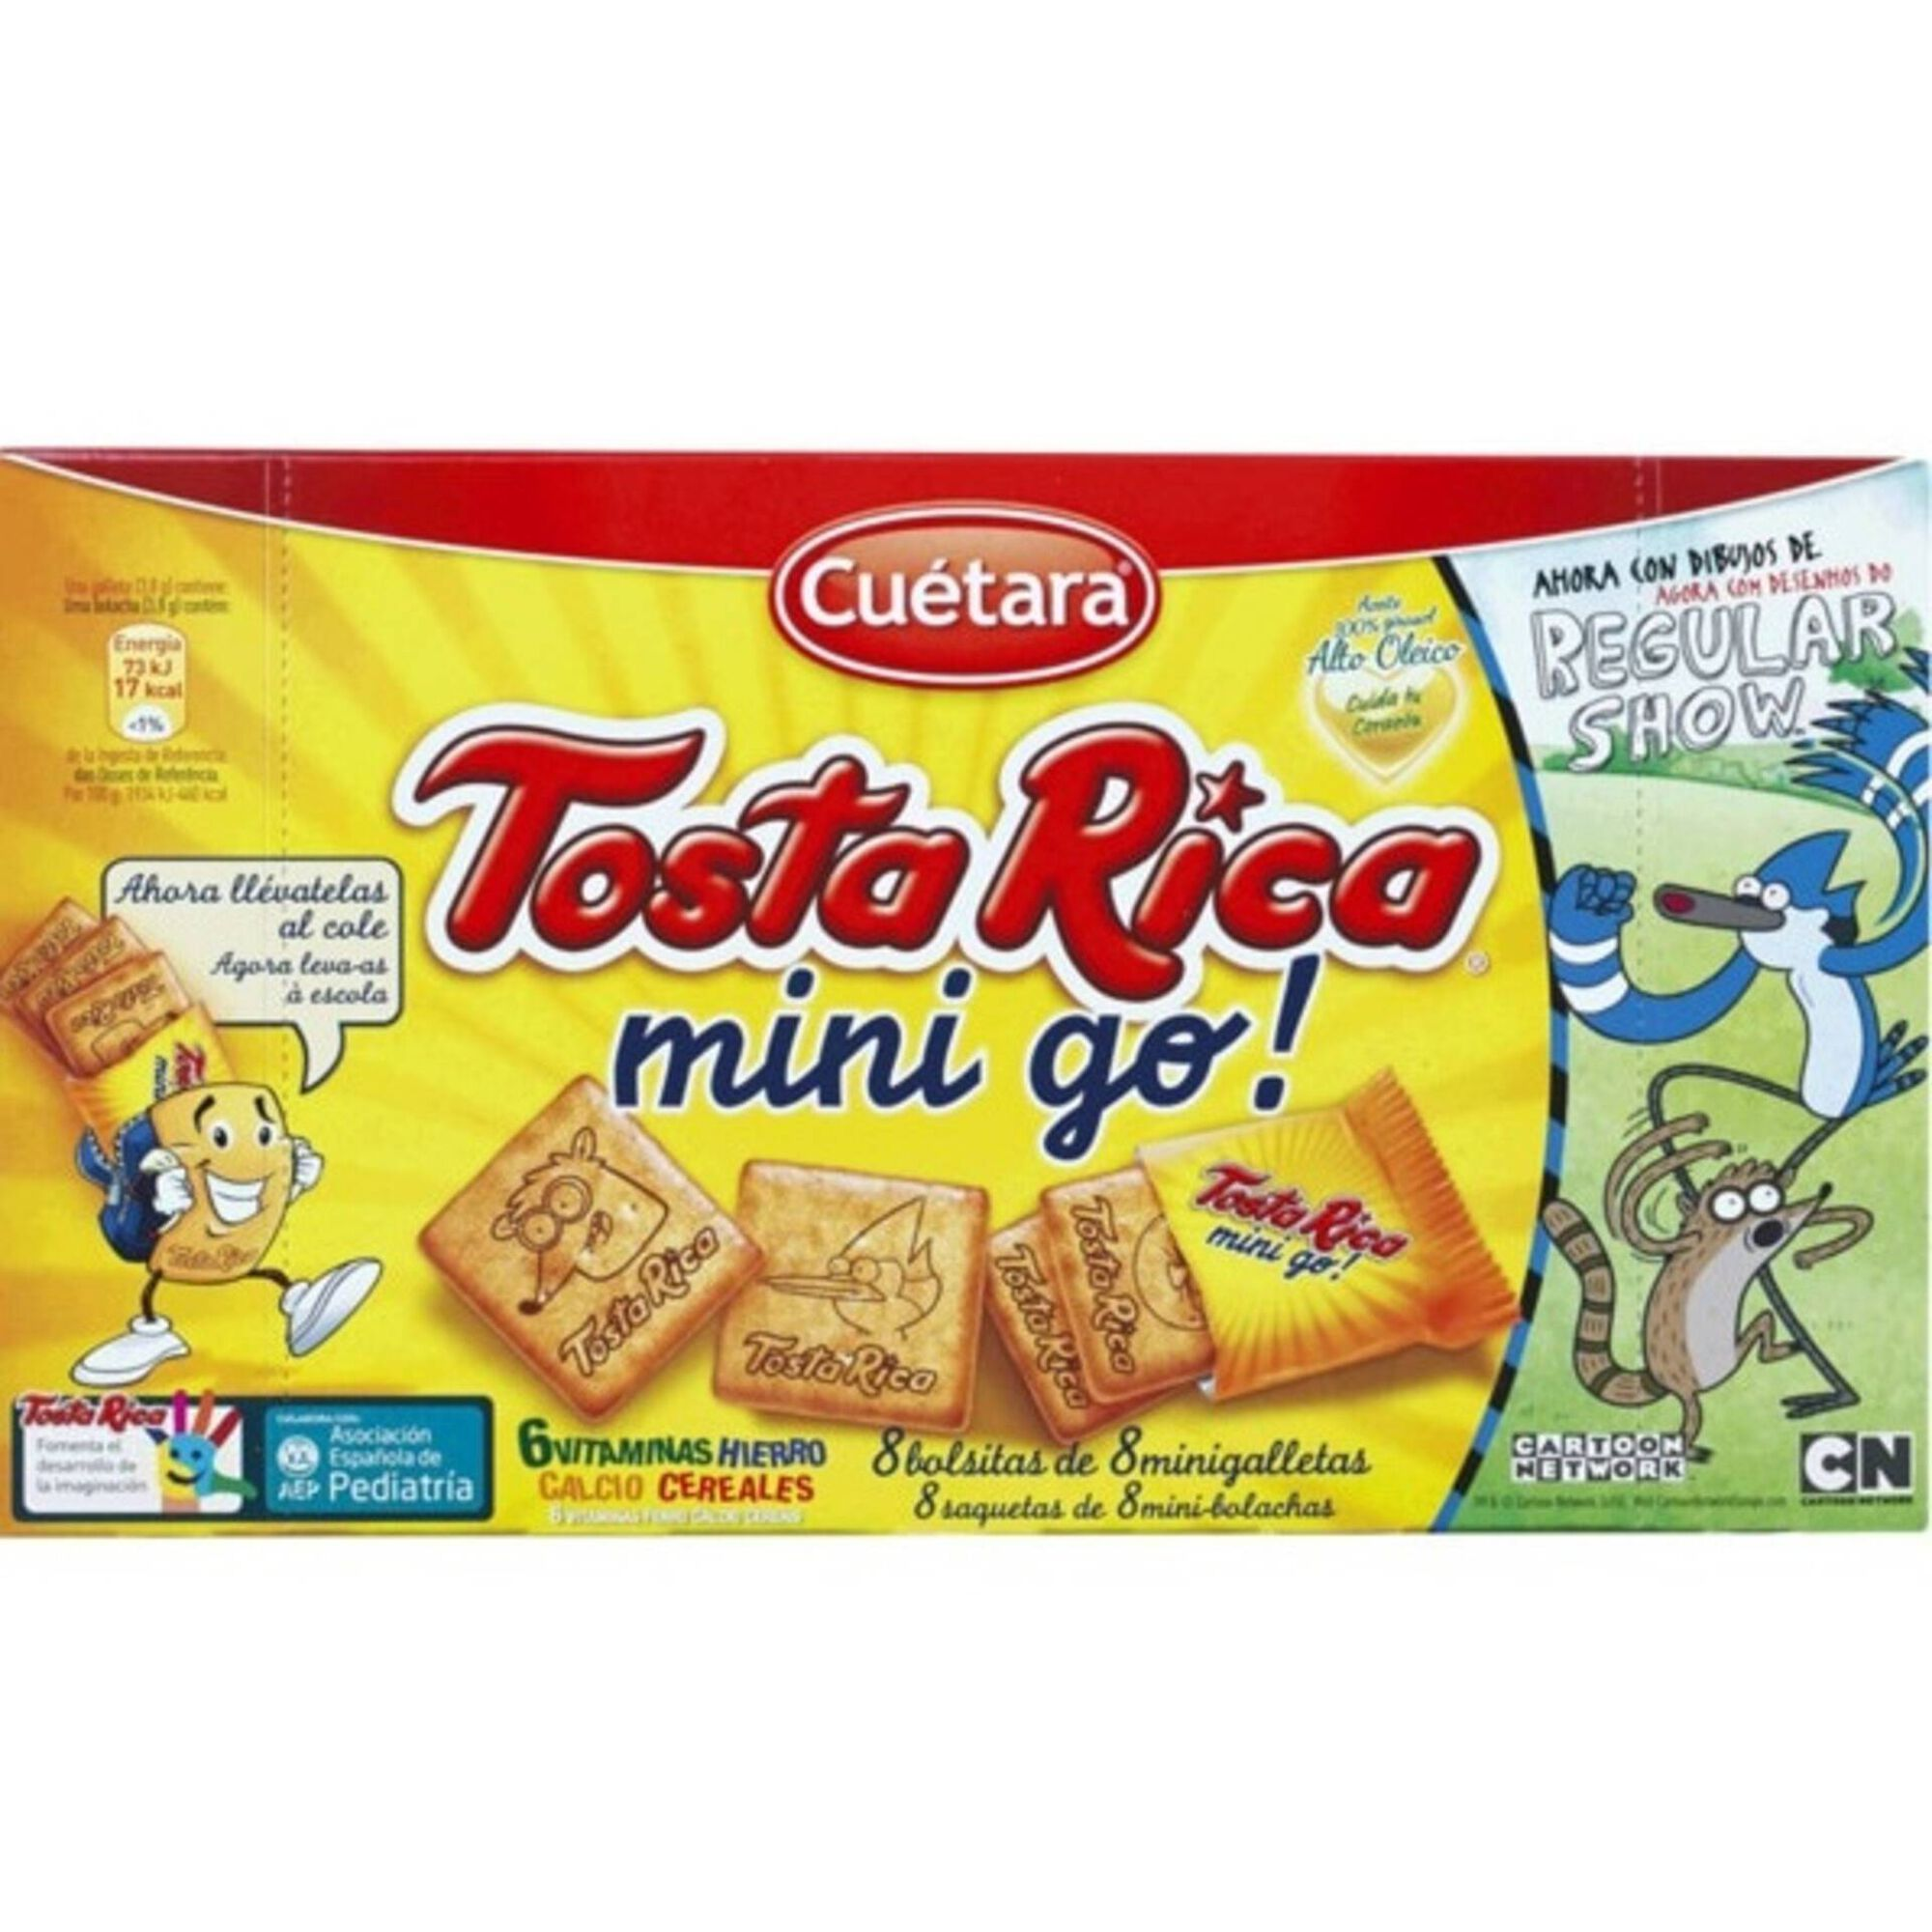 Tosta Rica Mini Go